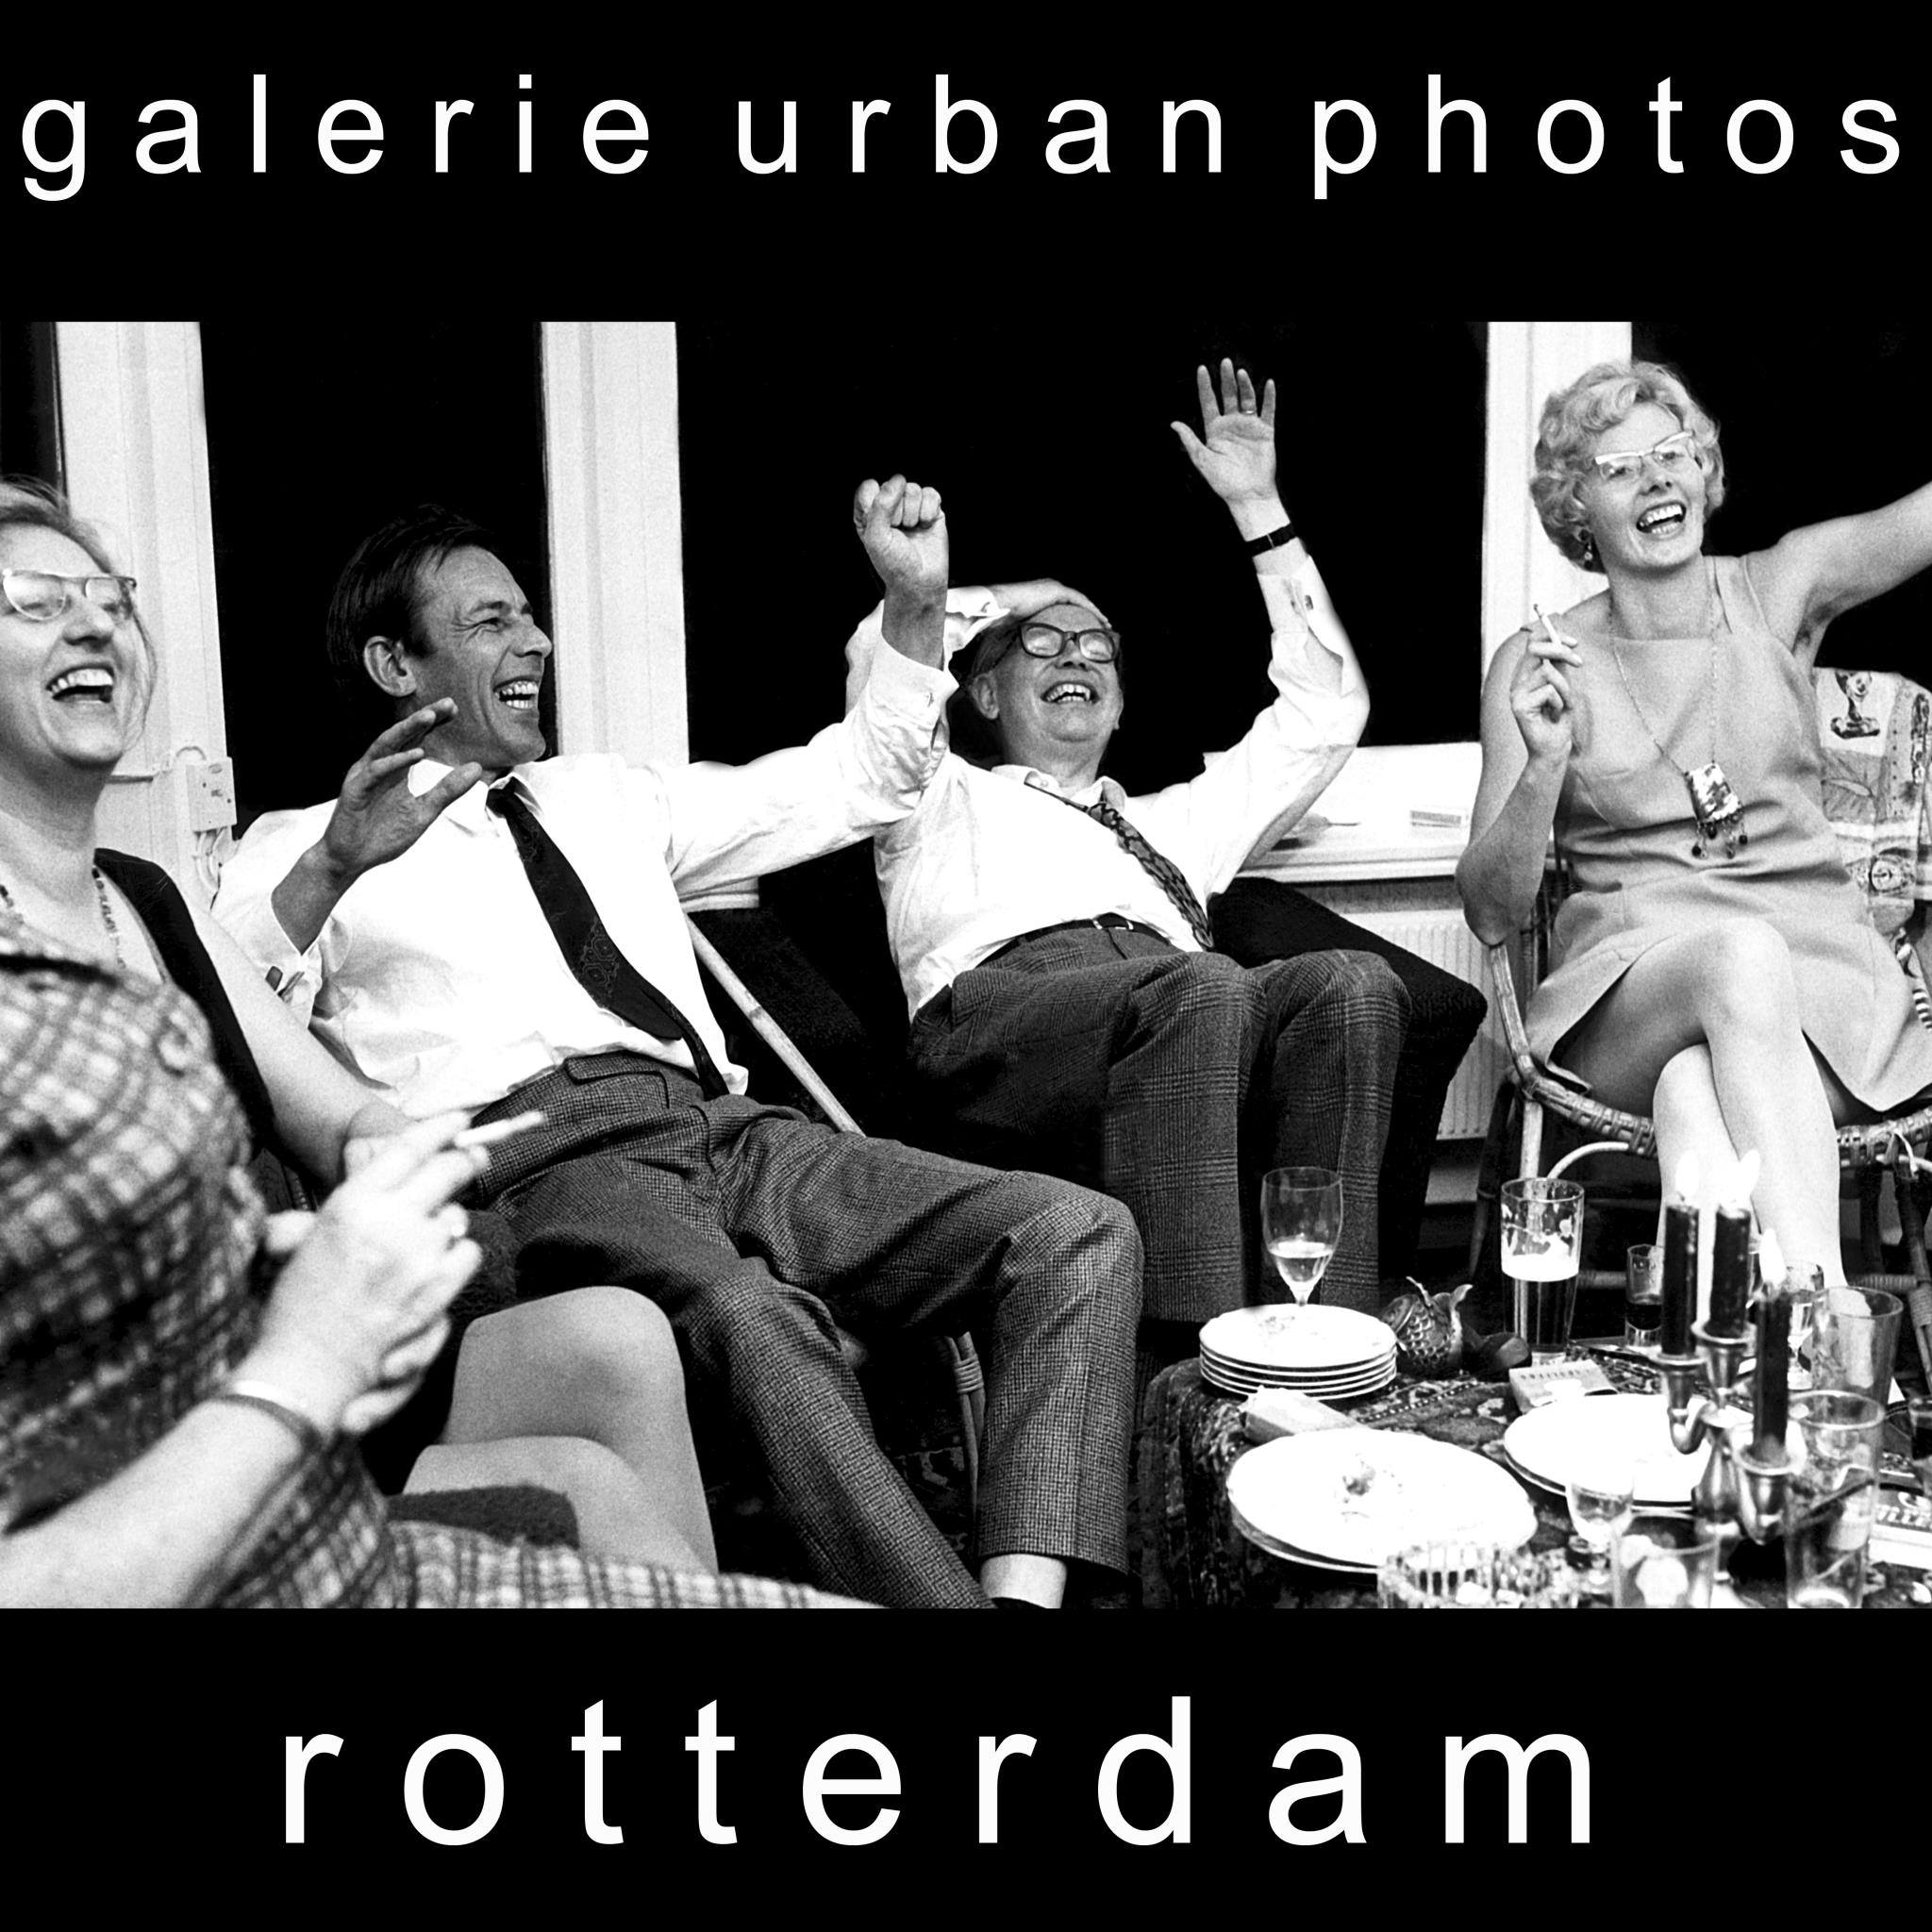 UrbanPhotos